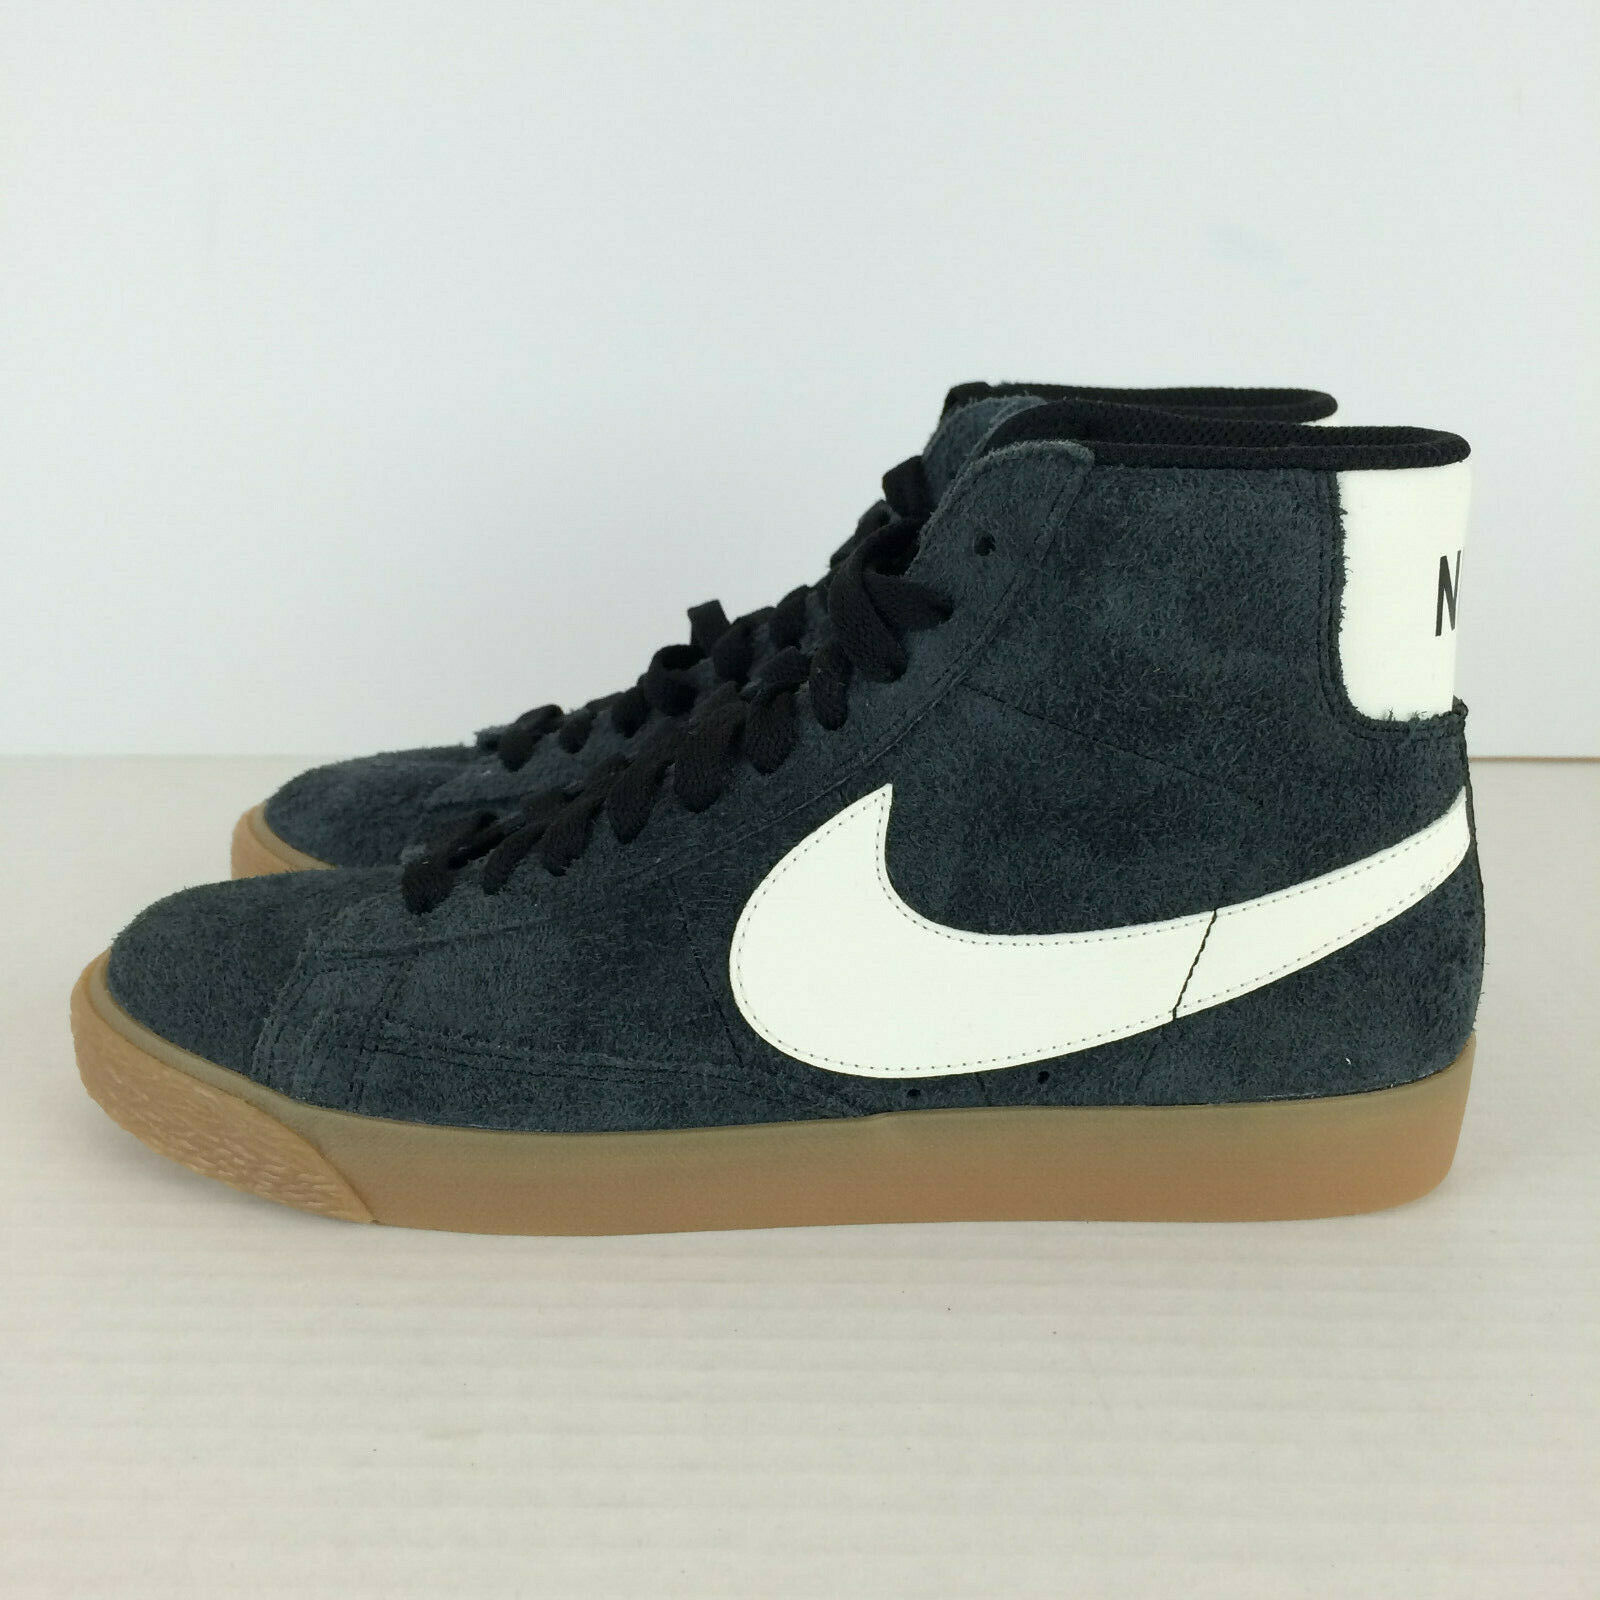 Nike Womens Blazer Mid Suede Vintage shoes Black Gum 518171-017 Women 7